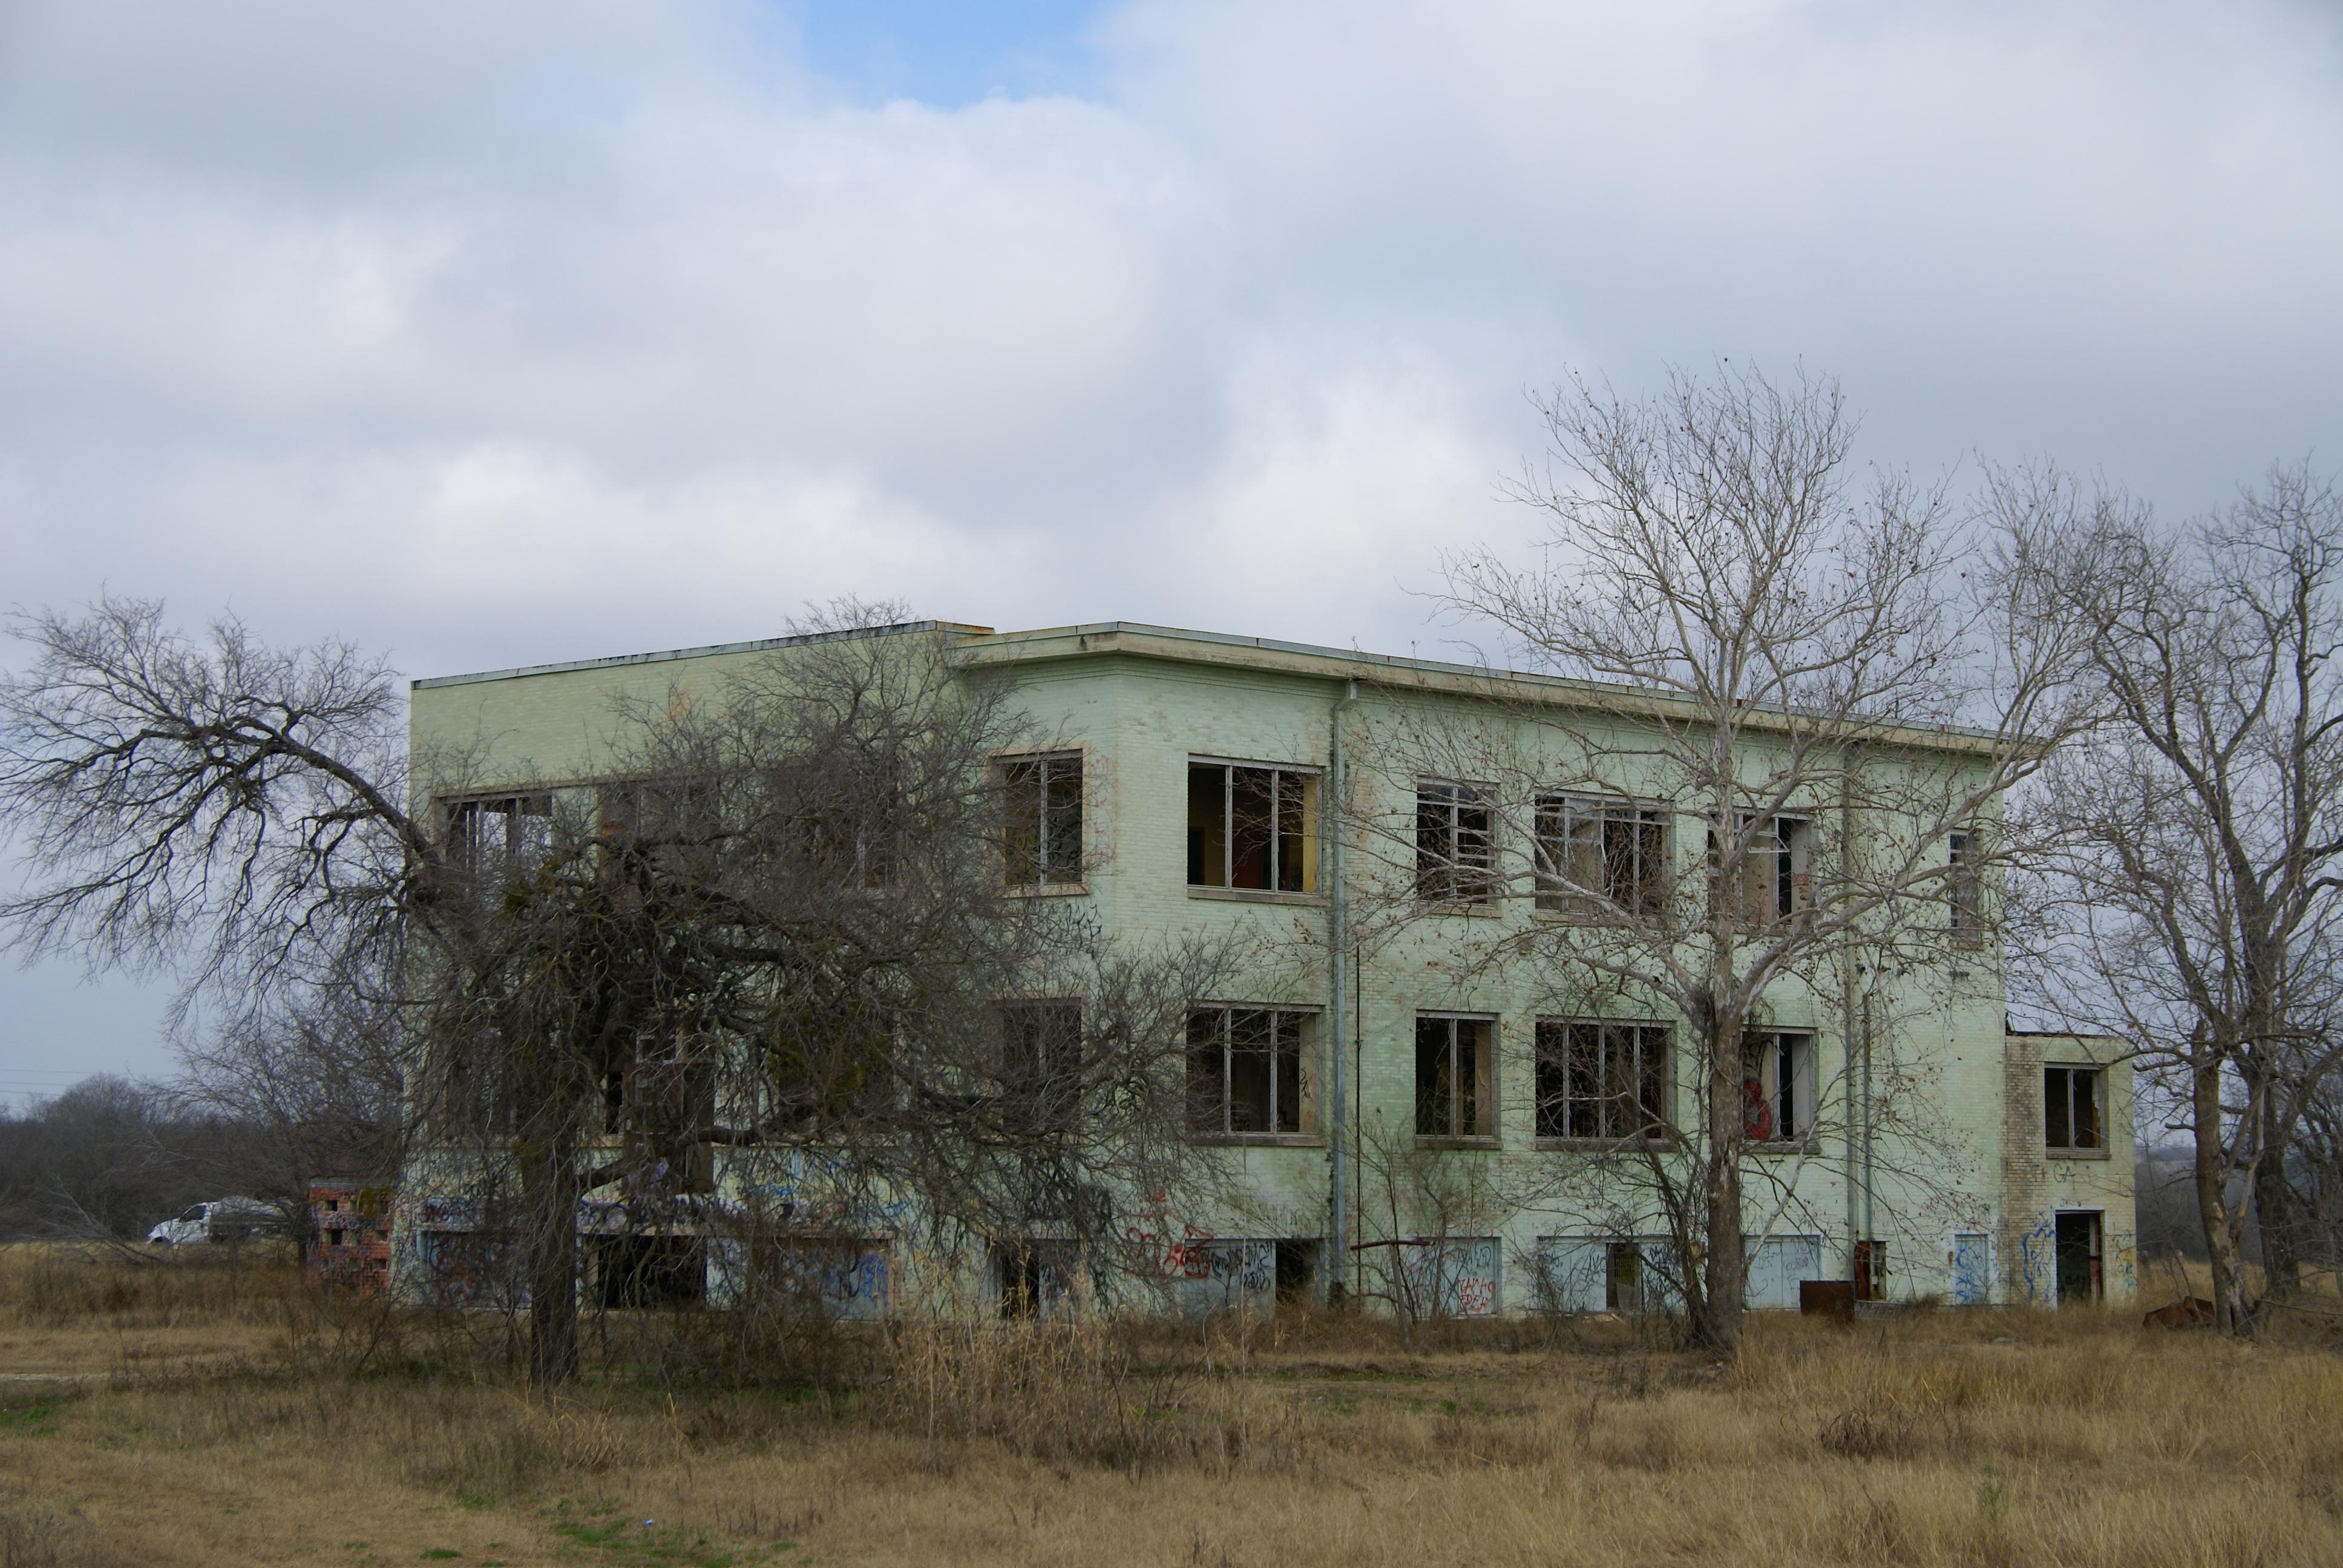 A Creepy Insane Asylum Still Stands In San Antonio Texas